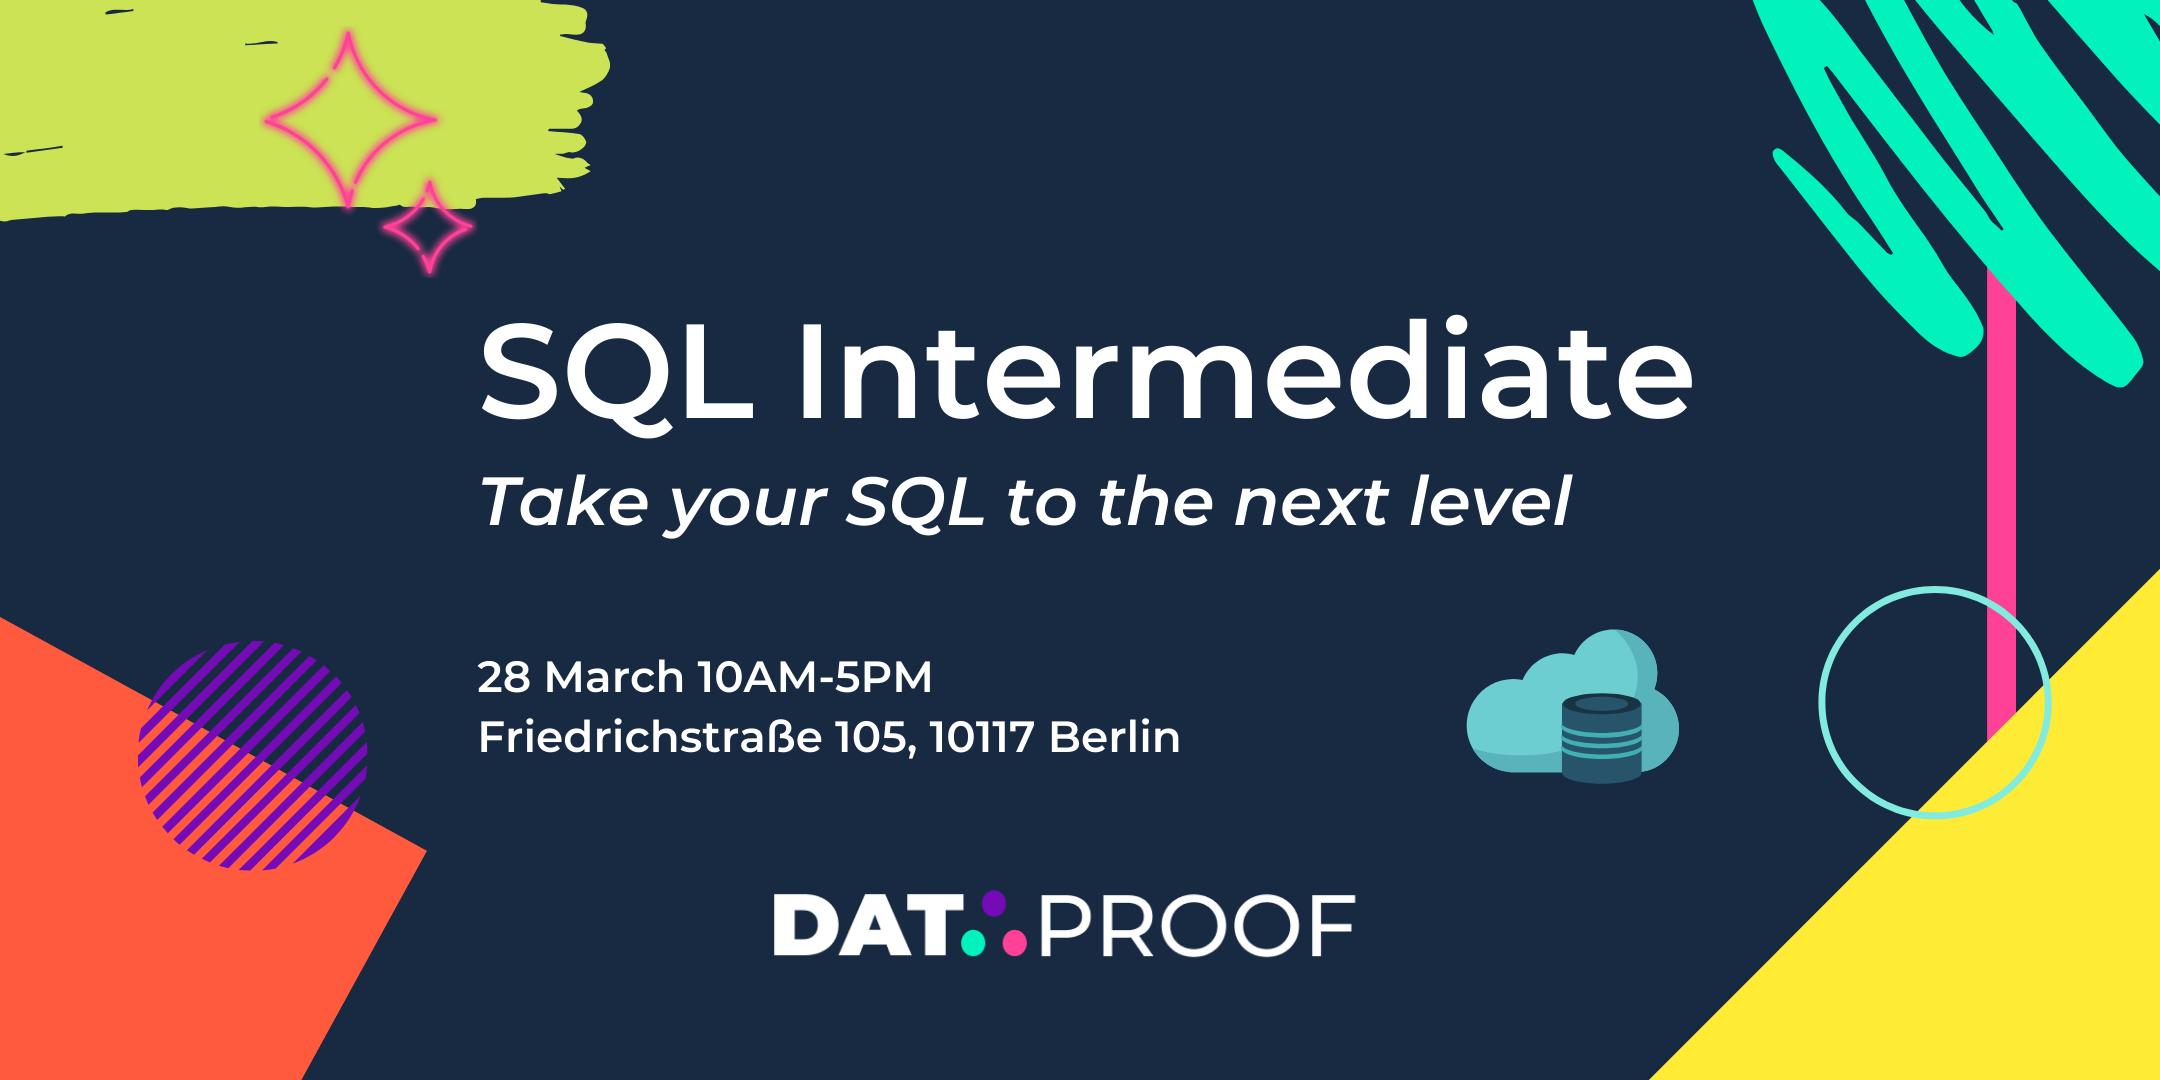 SQL Intermediate Workshop